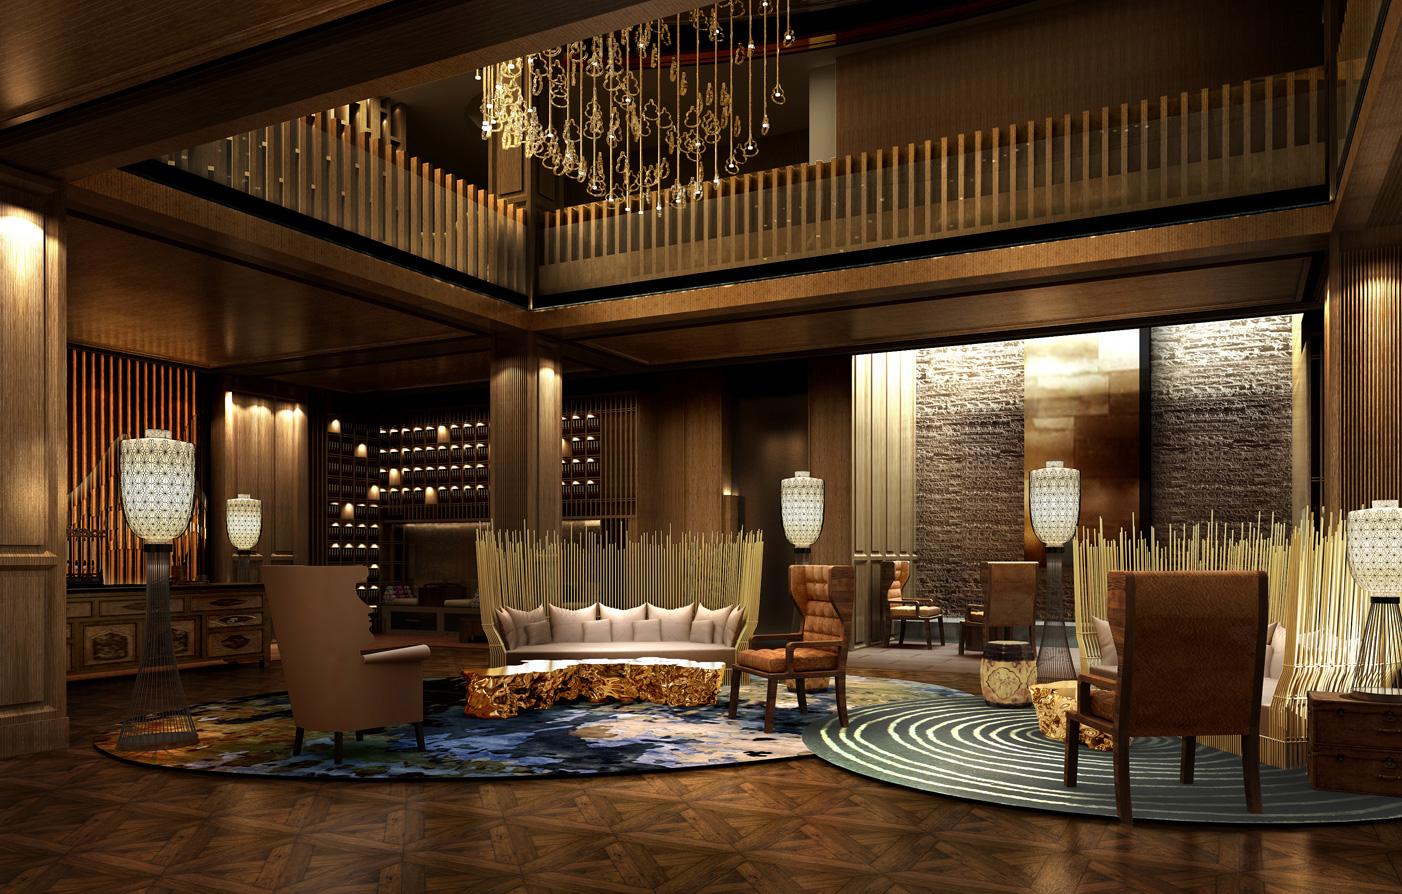 Chinese Lifestyle Hospitality Brand Opens Himalayas